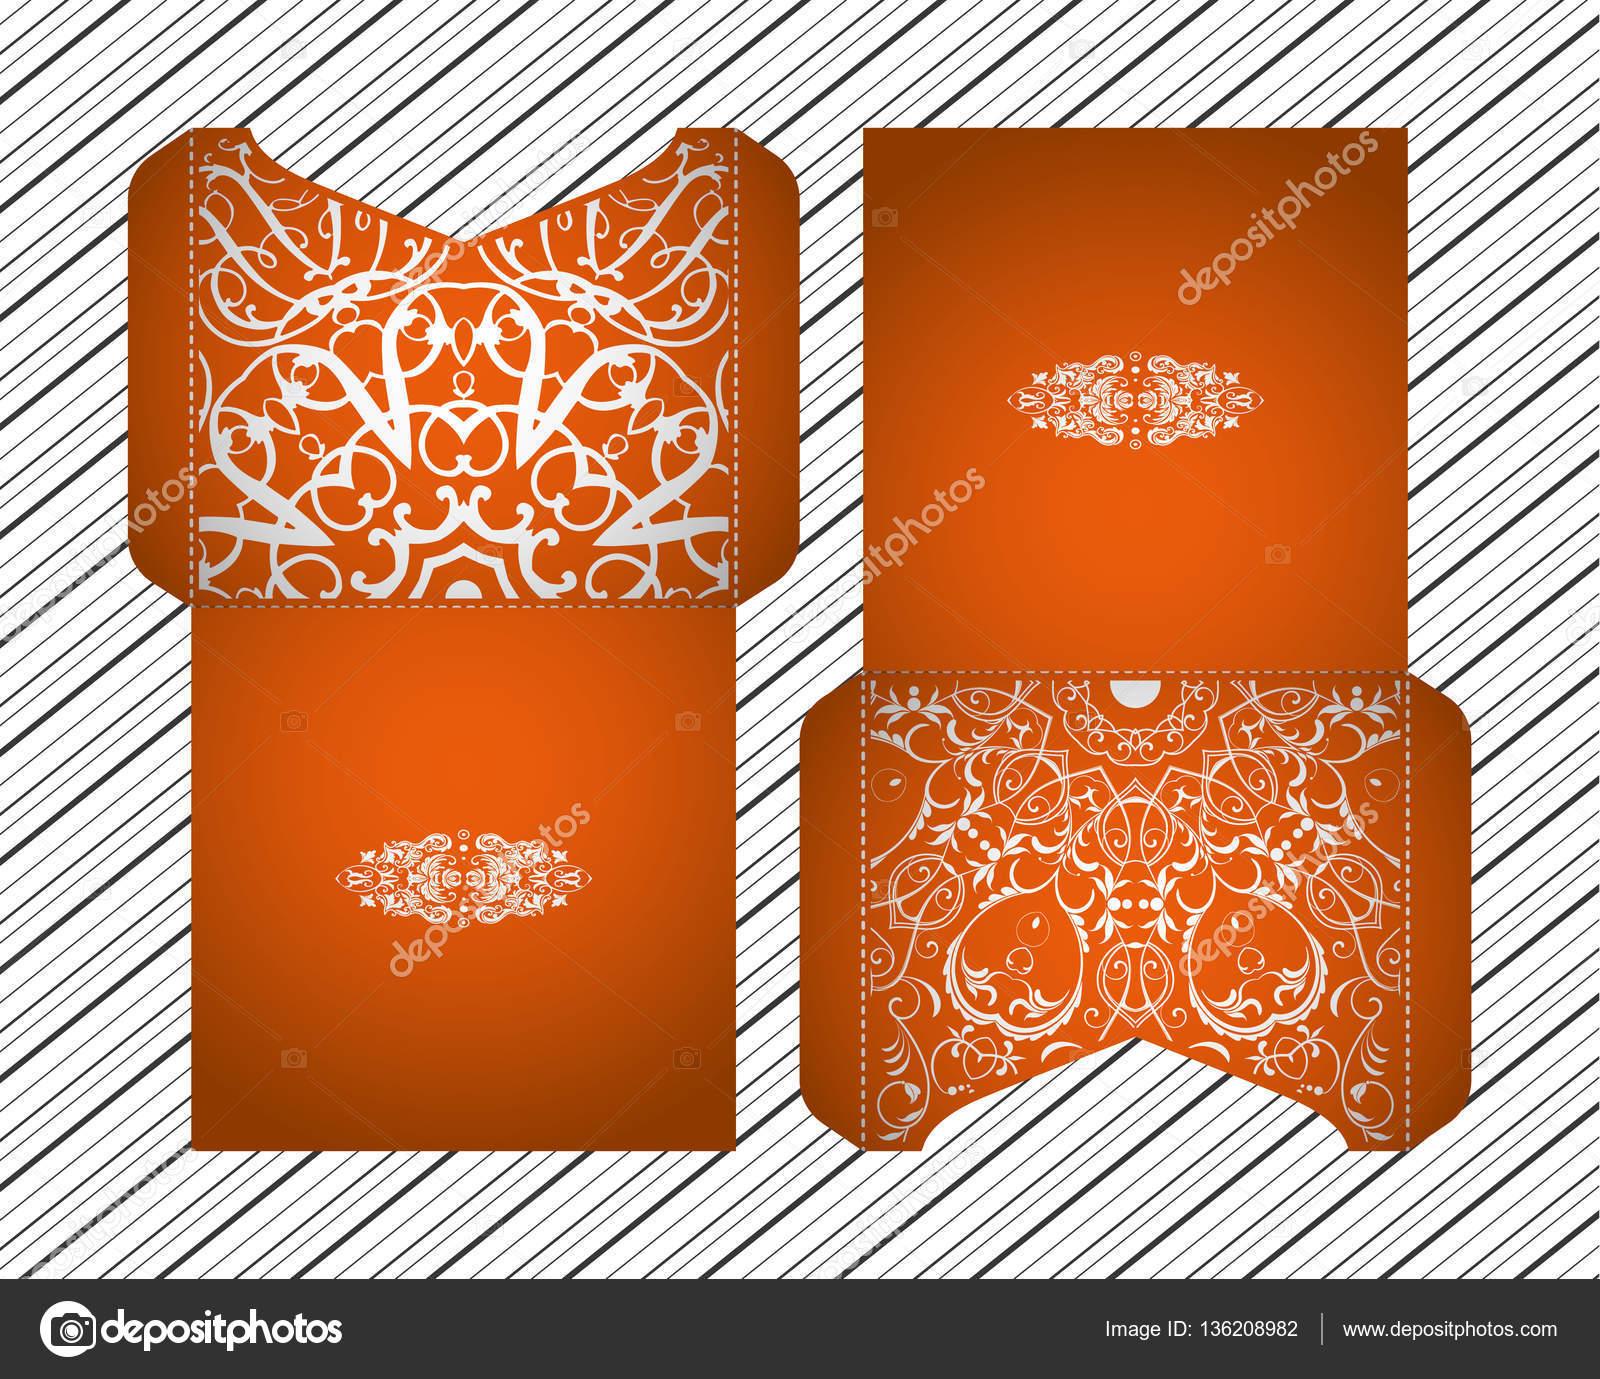 vector wedding invitation with laser cut patterns of the mandala envelope design ethnic style laser cut invitations collection envelopes for laser